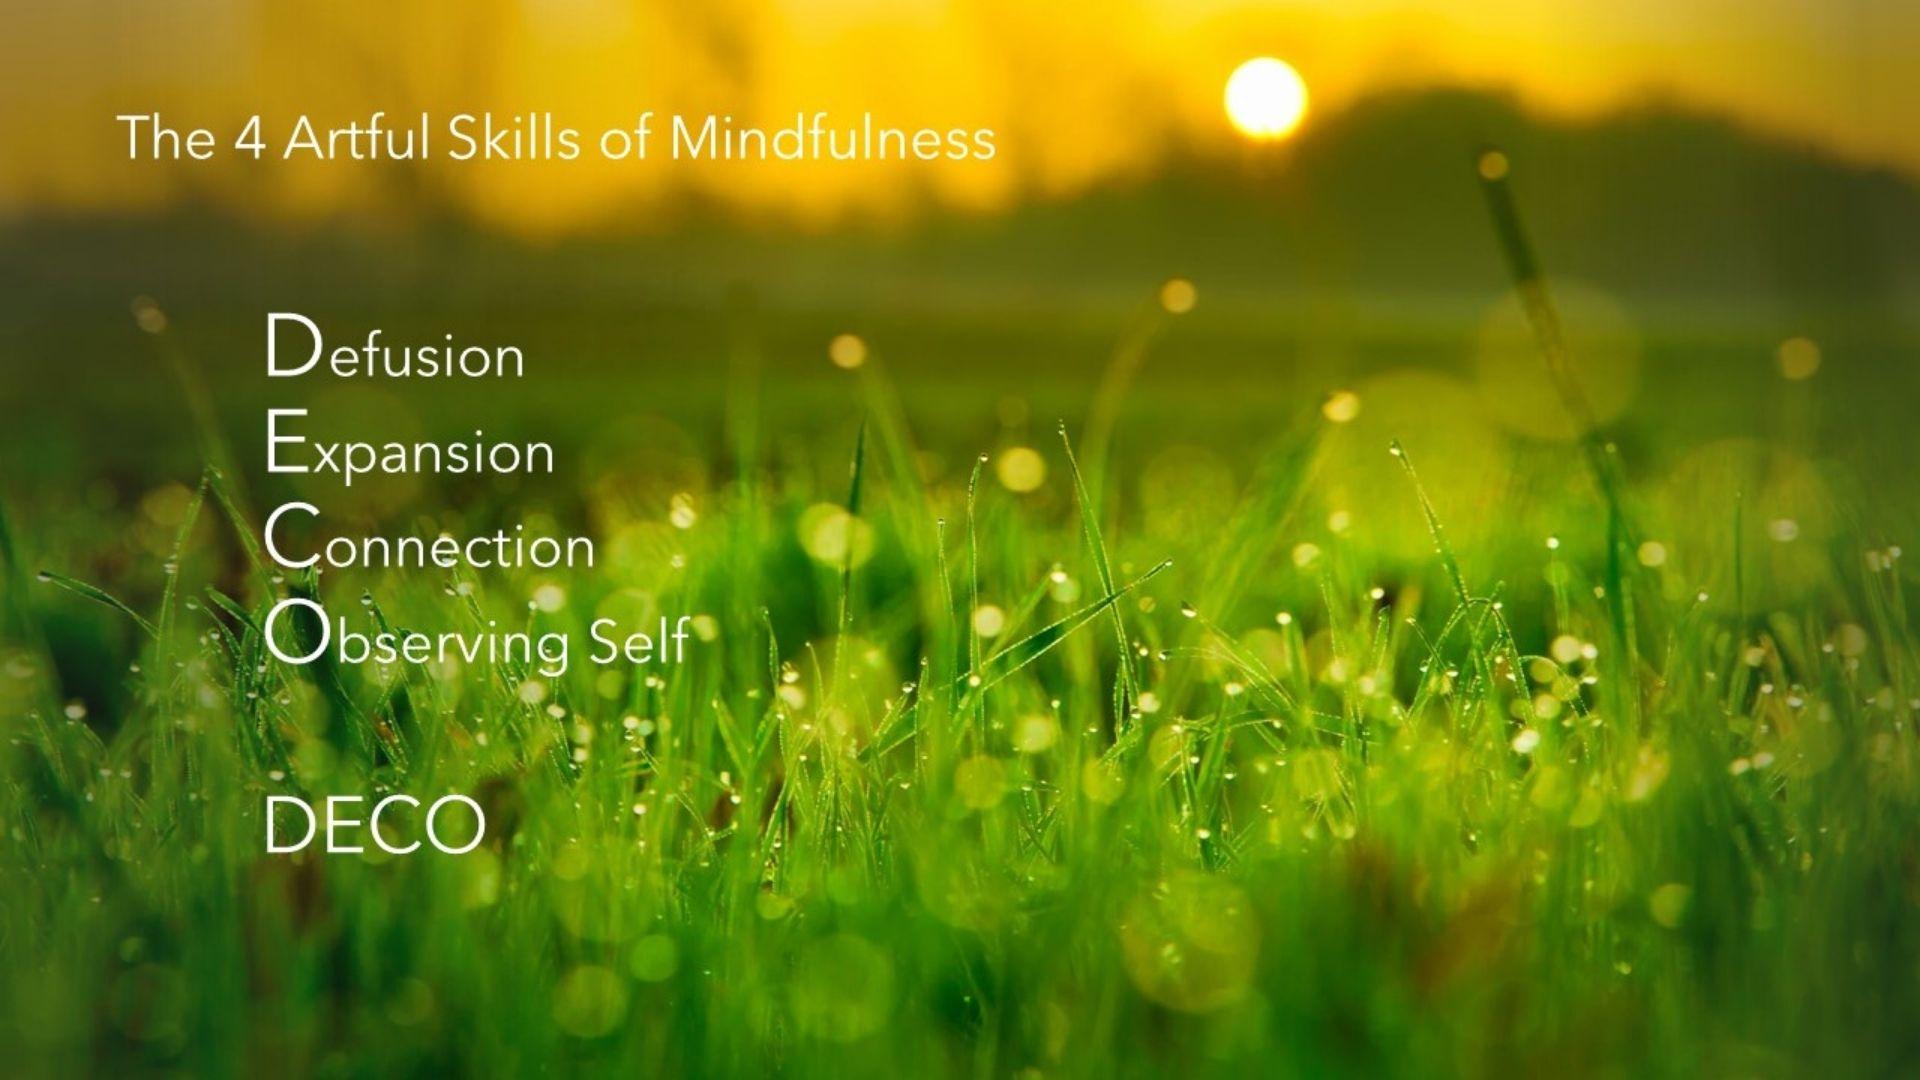 Mindfulness 4 skills 1920 x 1080 (1)